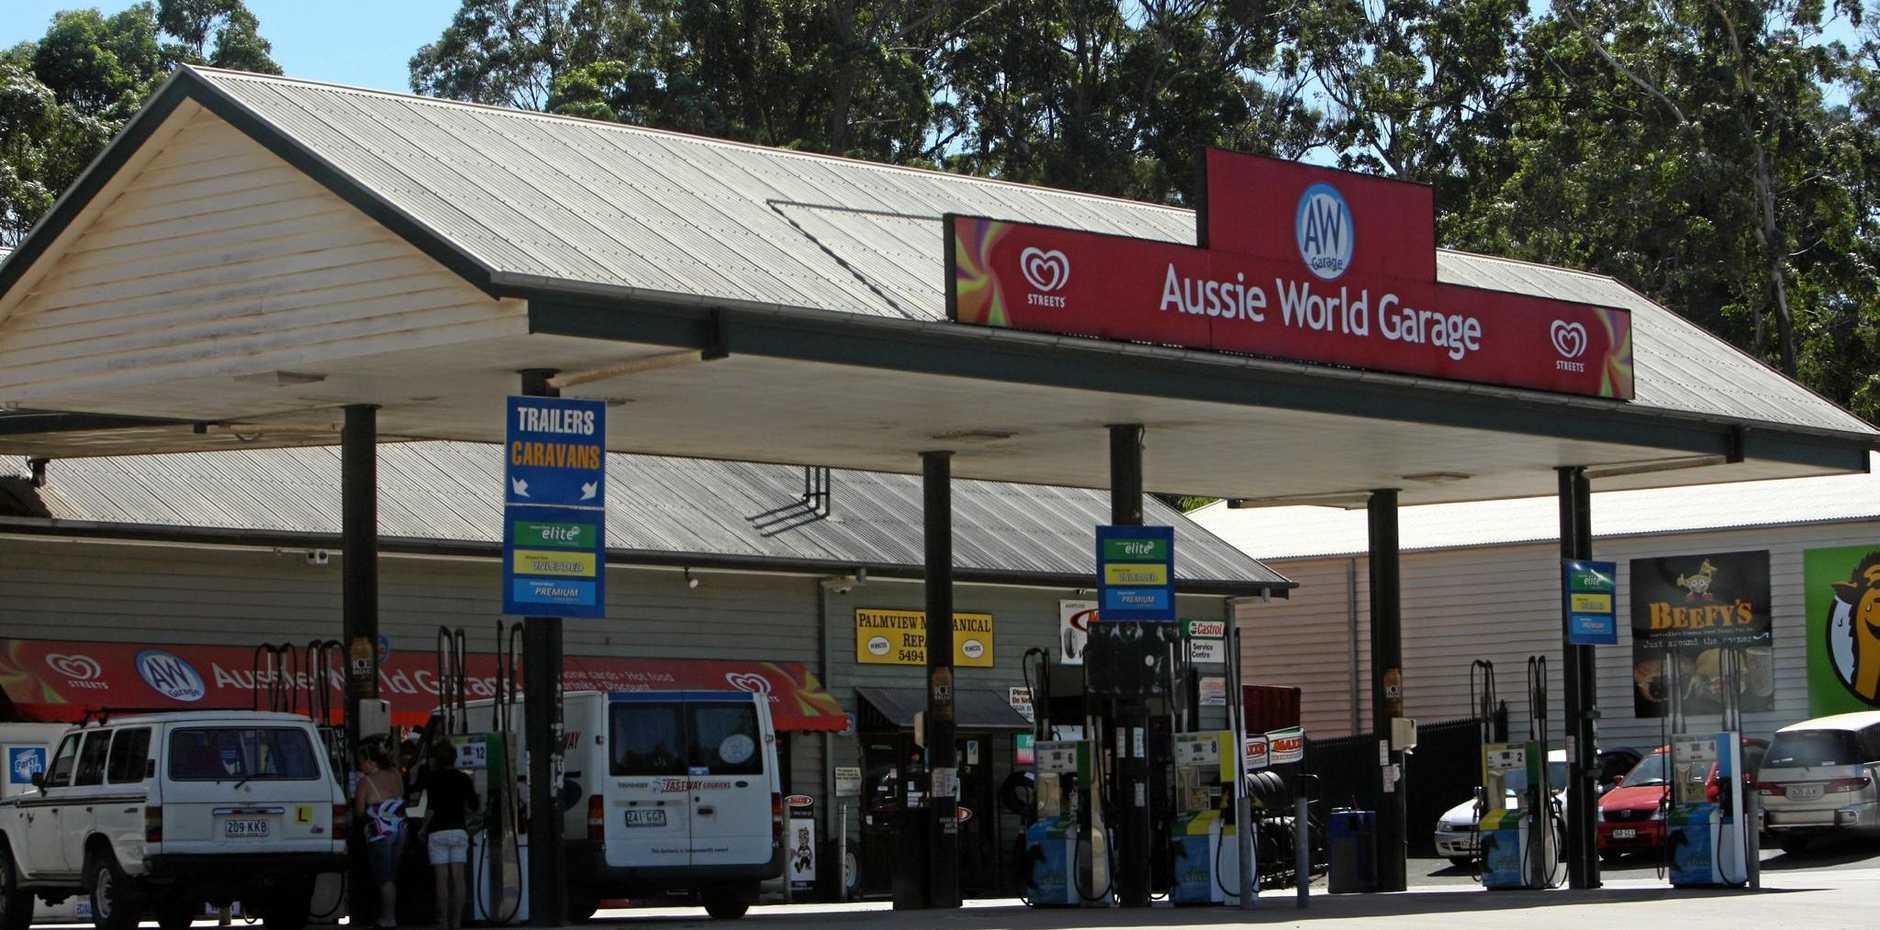 17/04/08 174131Aussie World garage. Petrol station. Fuel prices - petrol.Photo by Michaela O'Neill